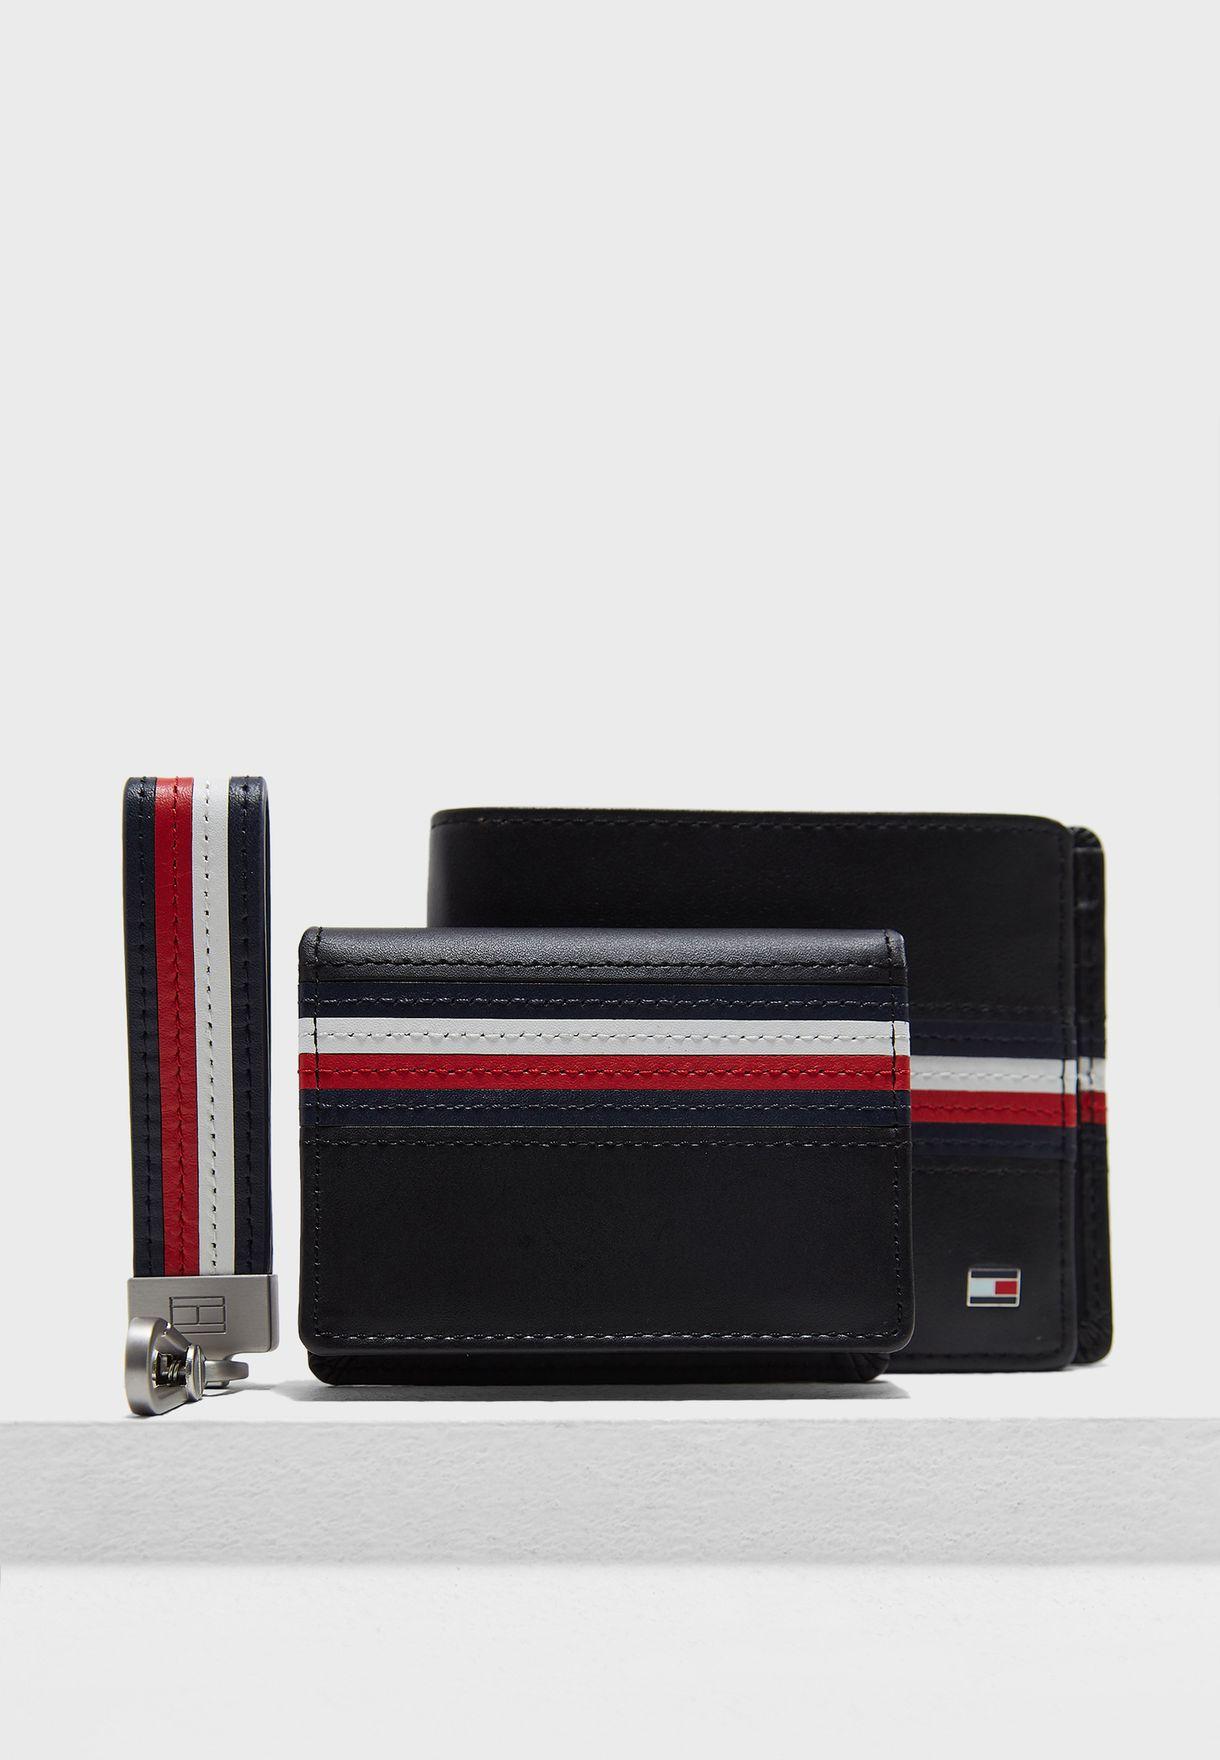 4481be871 تسوق طقم محفظة + حافظة بطاقات + حلقة مفاتيح ماركة تومي هيلفيغر لون ...